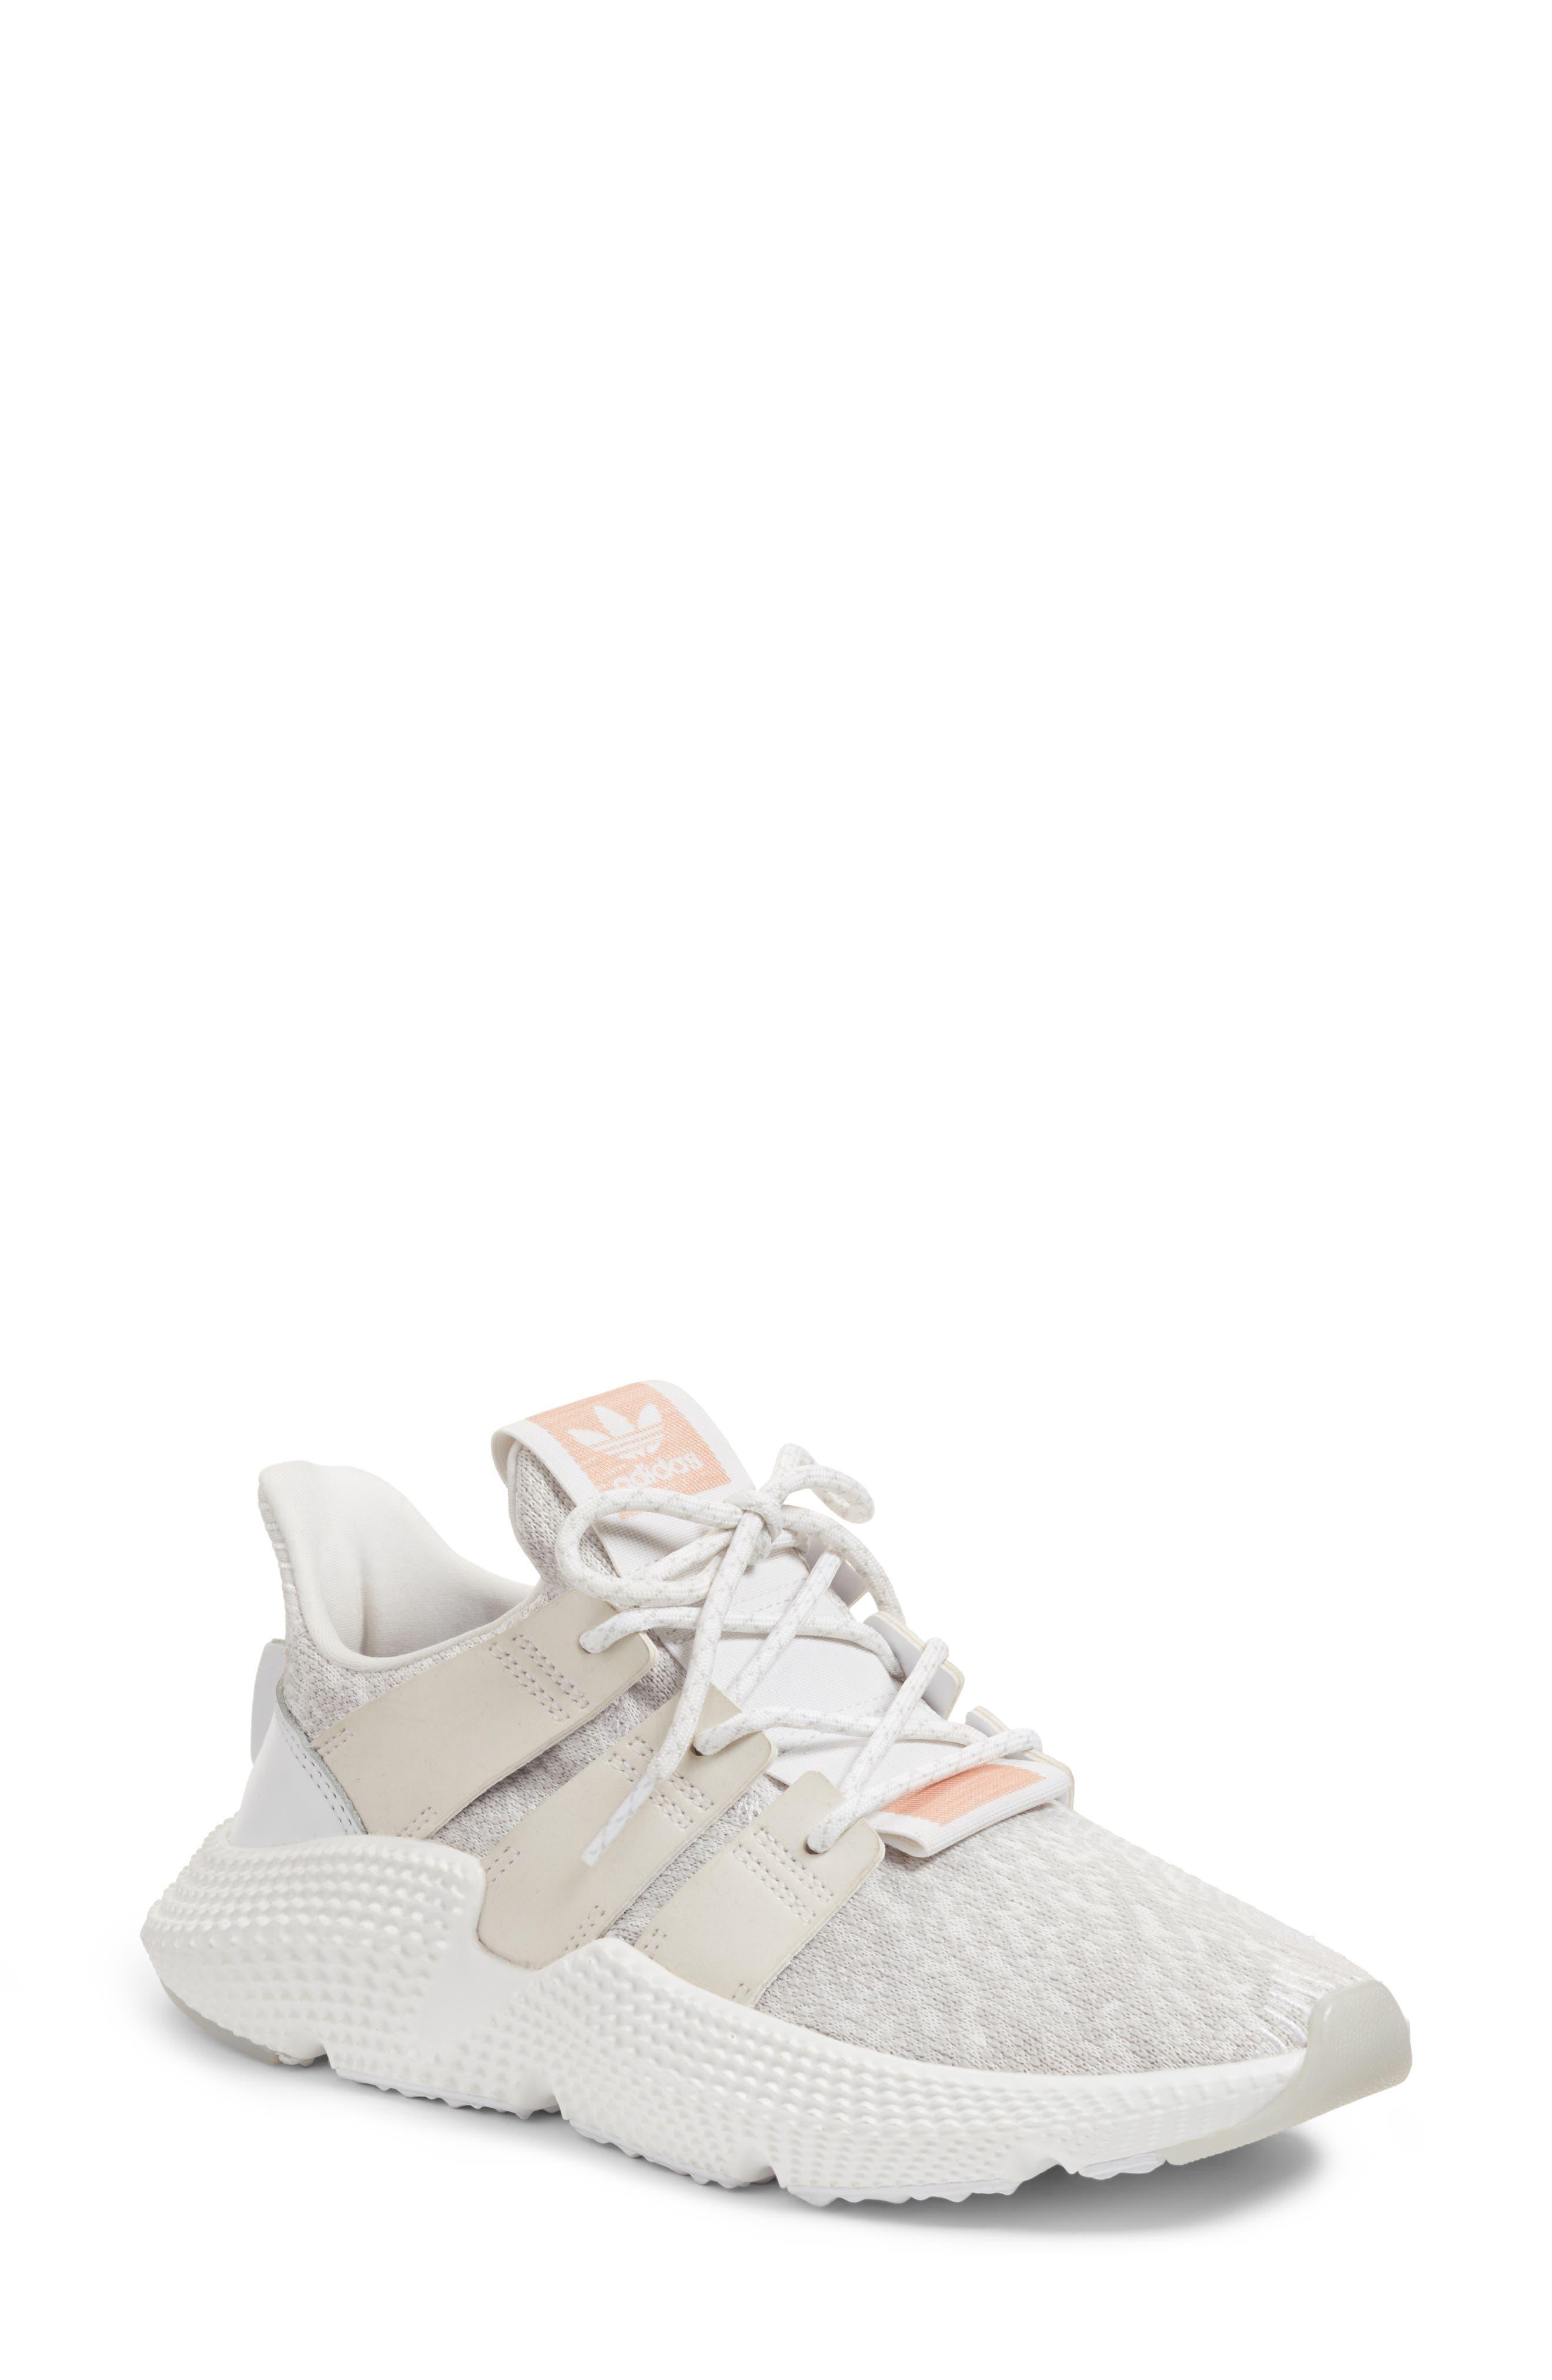 Prophere Sneaker,                             Main thumbnail 1, color,                             White/ White/ Supplier Colour